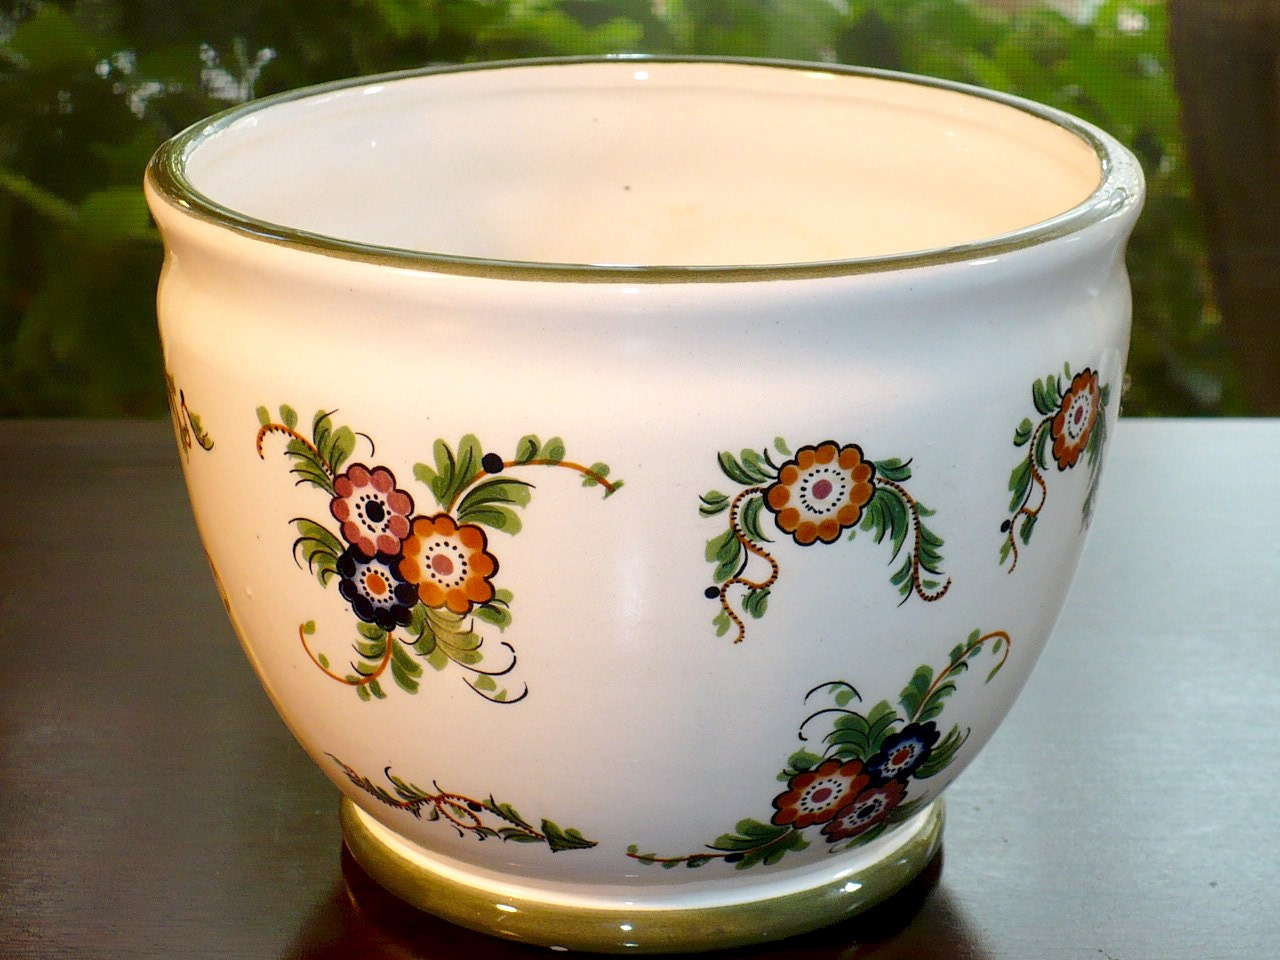 Capodimonten Italy Ceramic Planter Flower Pot Planter Pot